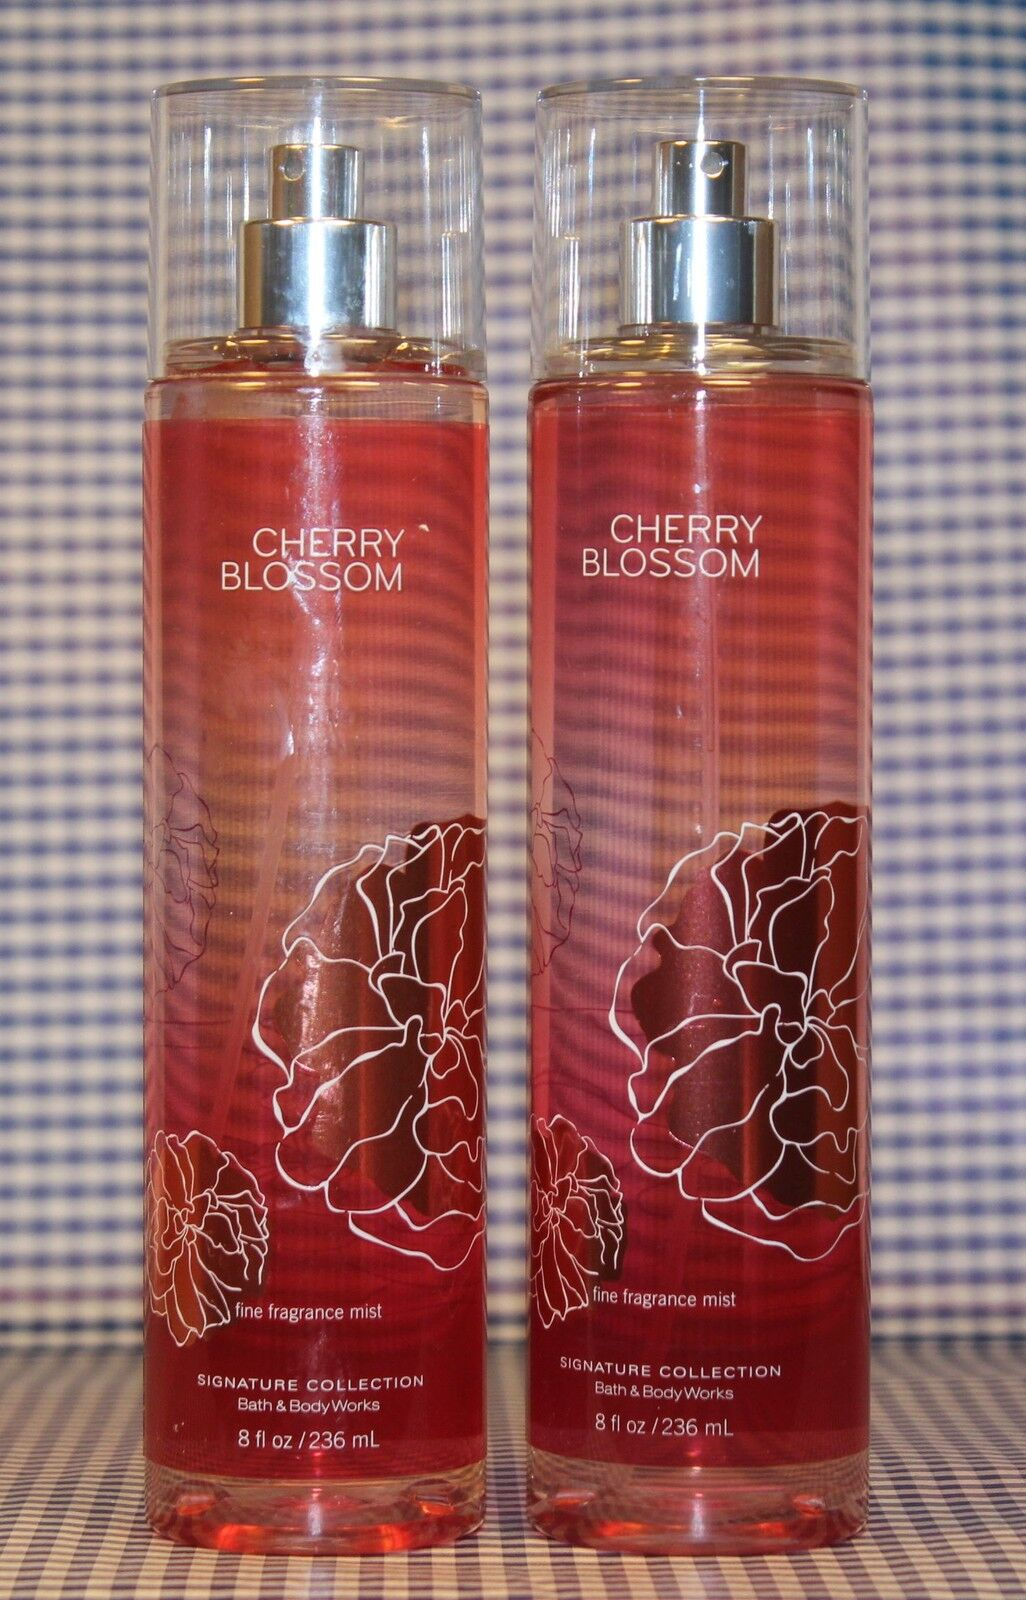 2 Bath Amp Body Works Cherry Blossom Fine Fragrance Mist